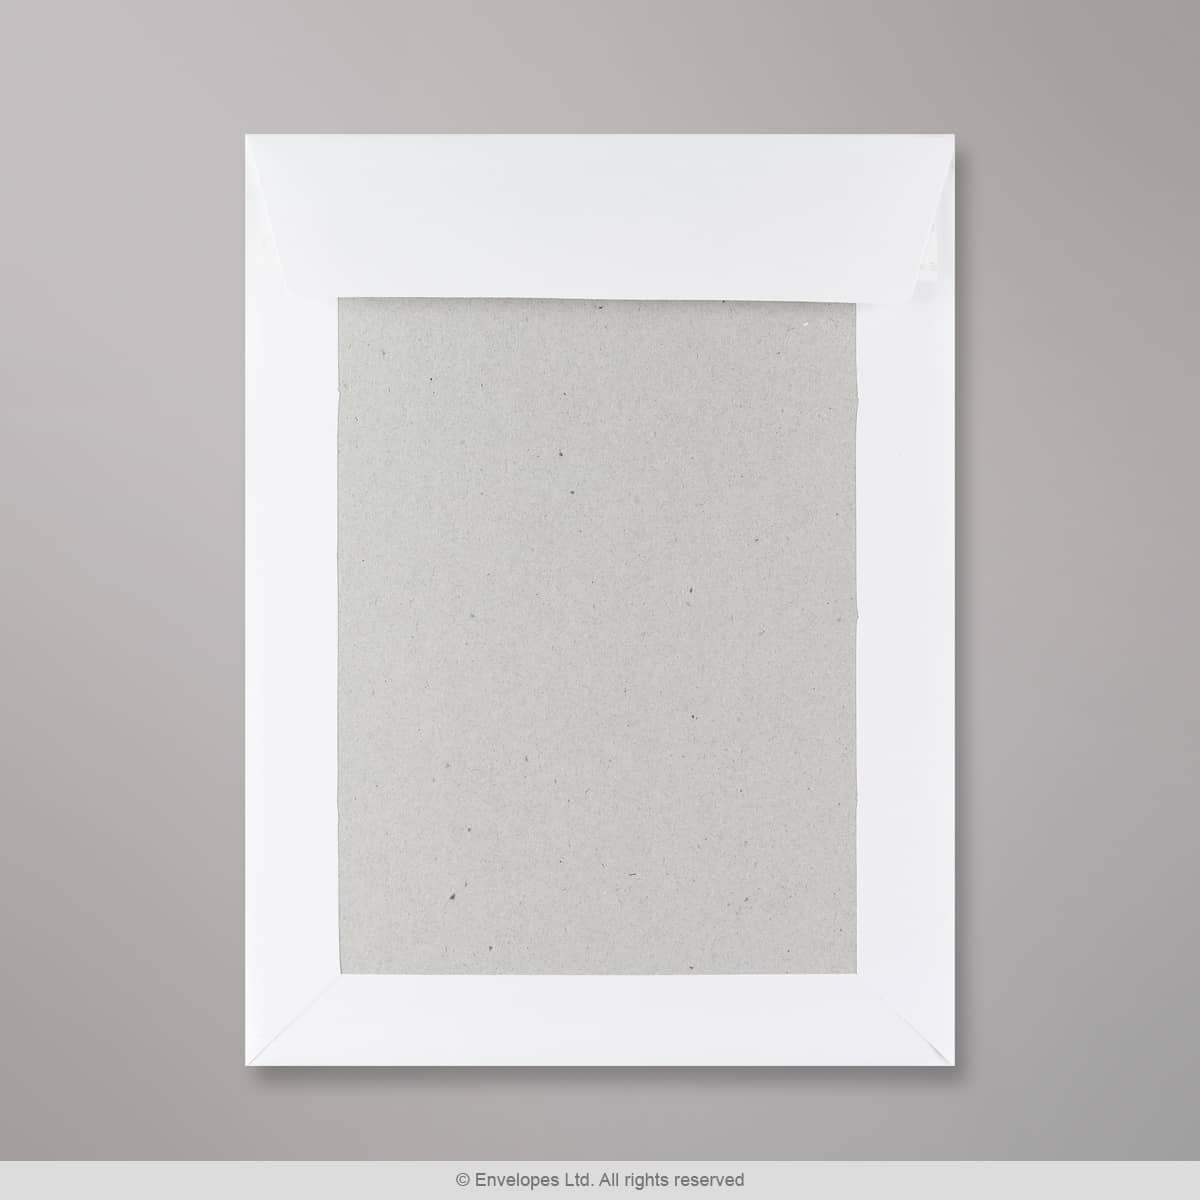 241x178 mm Busta con dorso rigido bianca